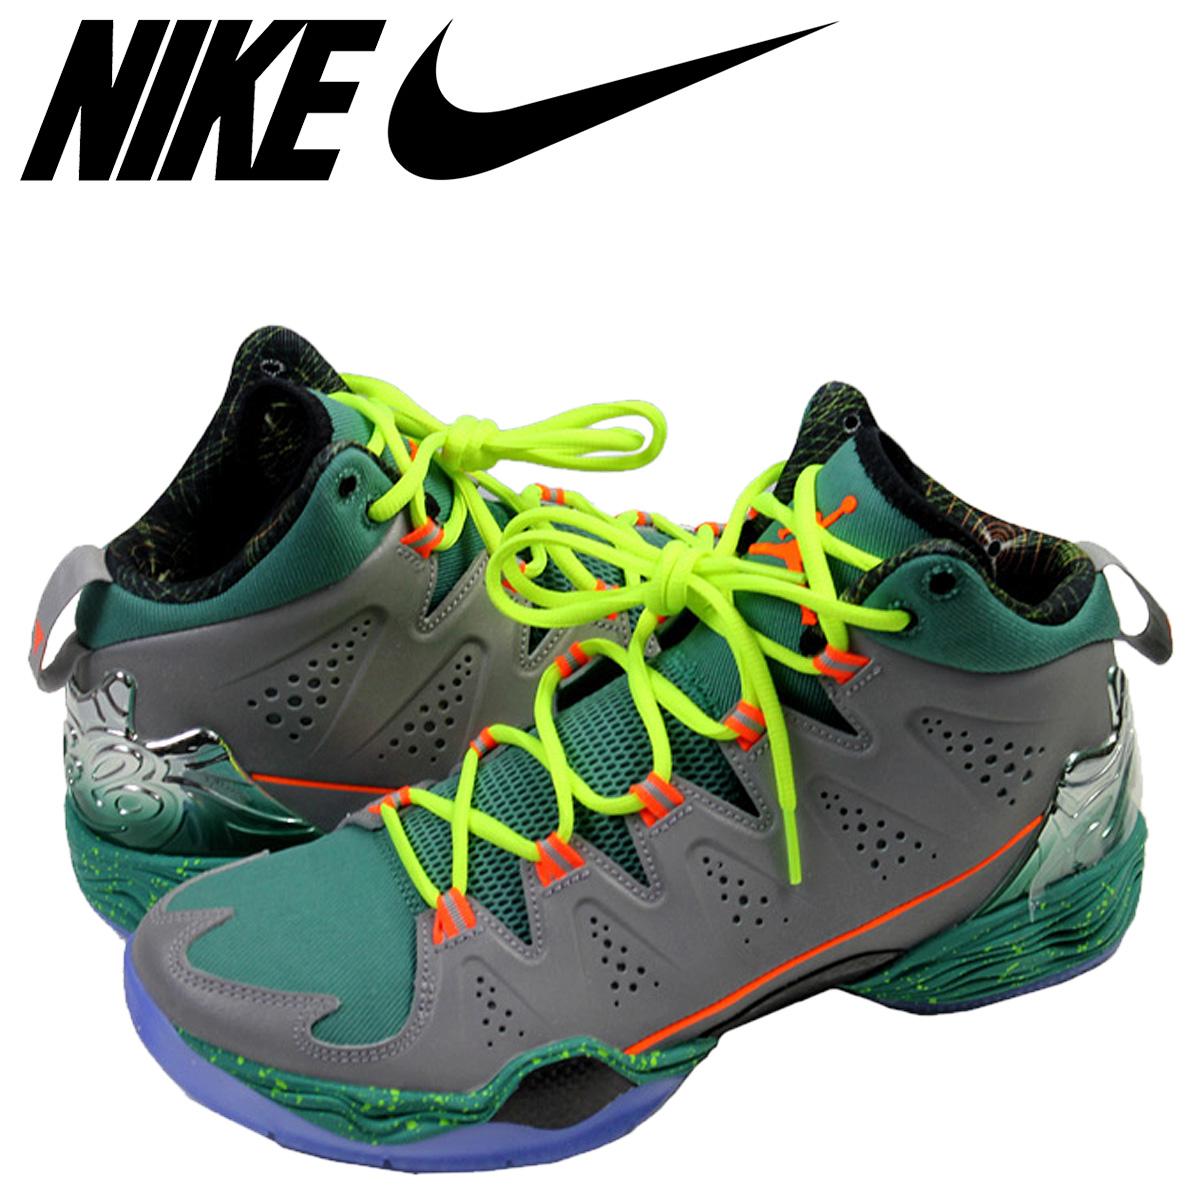 819d9cbe900 Nike NIKE Air Jordan sneakers AIR JORDAN MELO M10 CHRISTMAS Air Jordan Melo  M10 Christmas 640318-025 grey mens